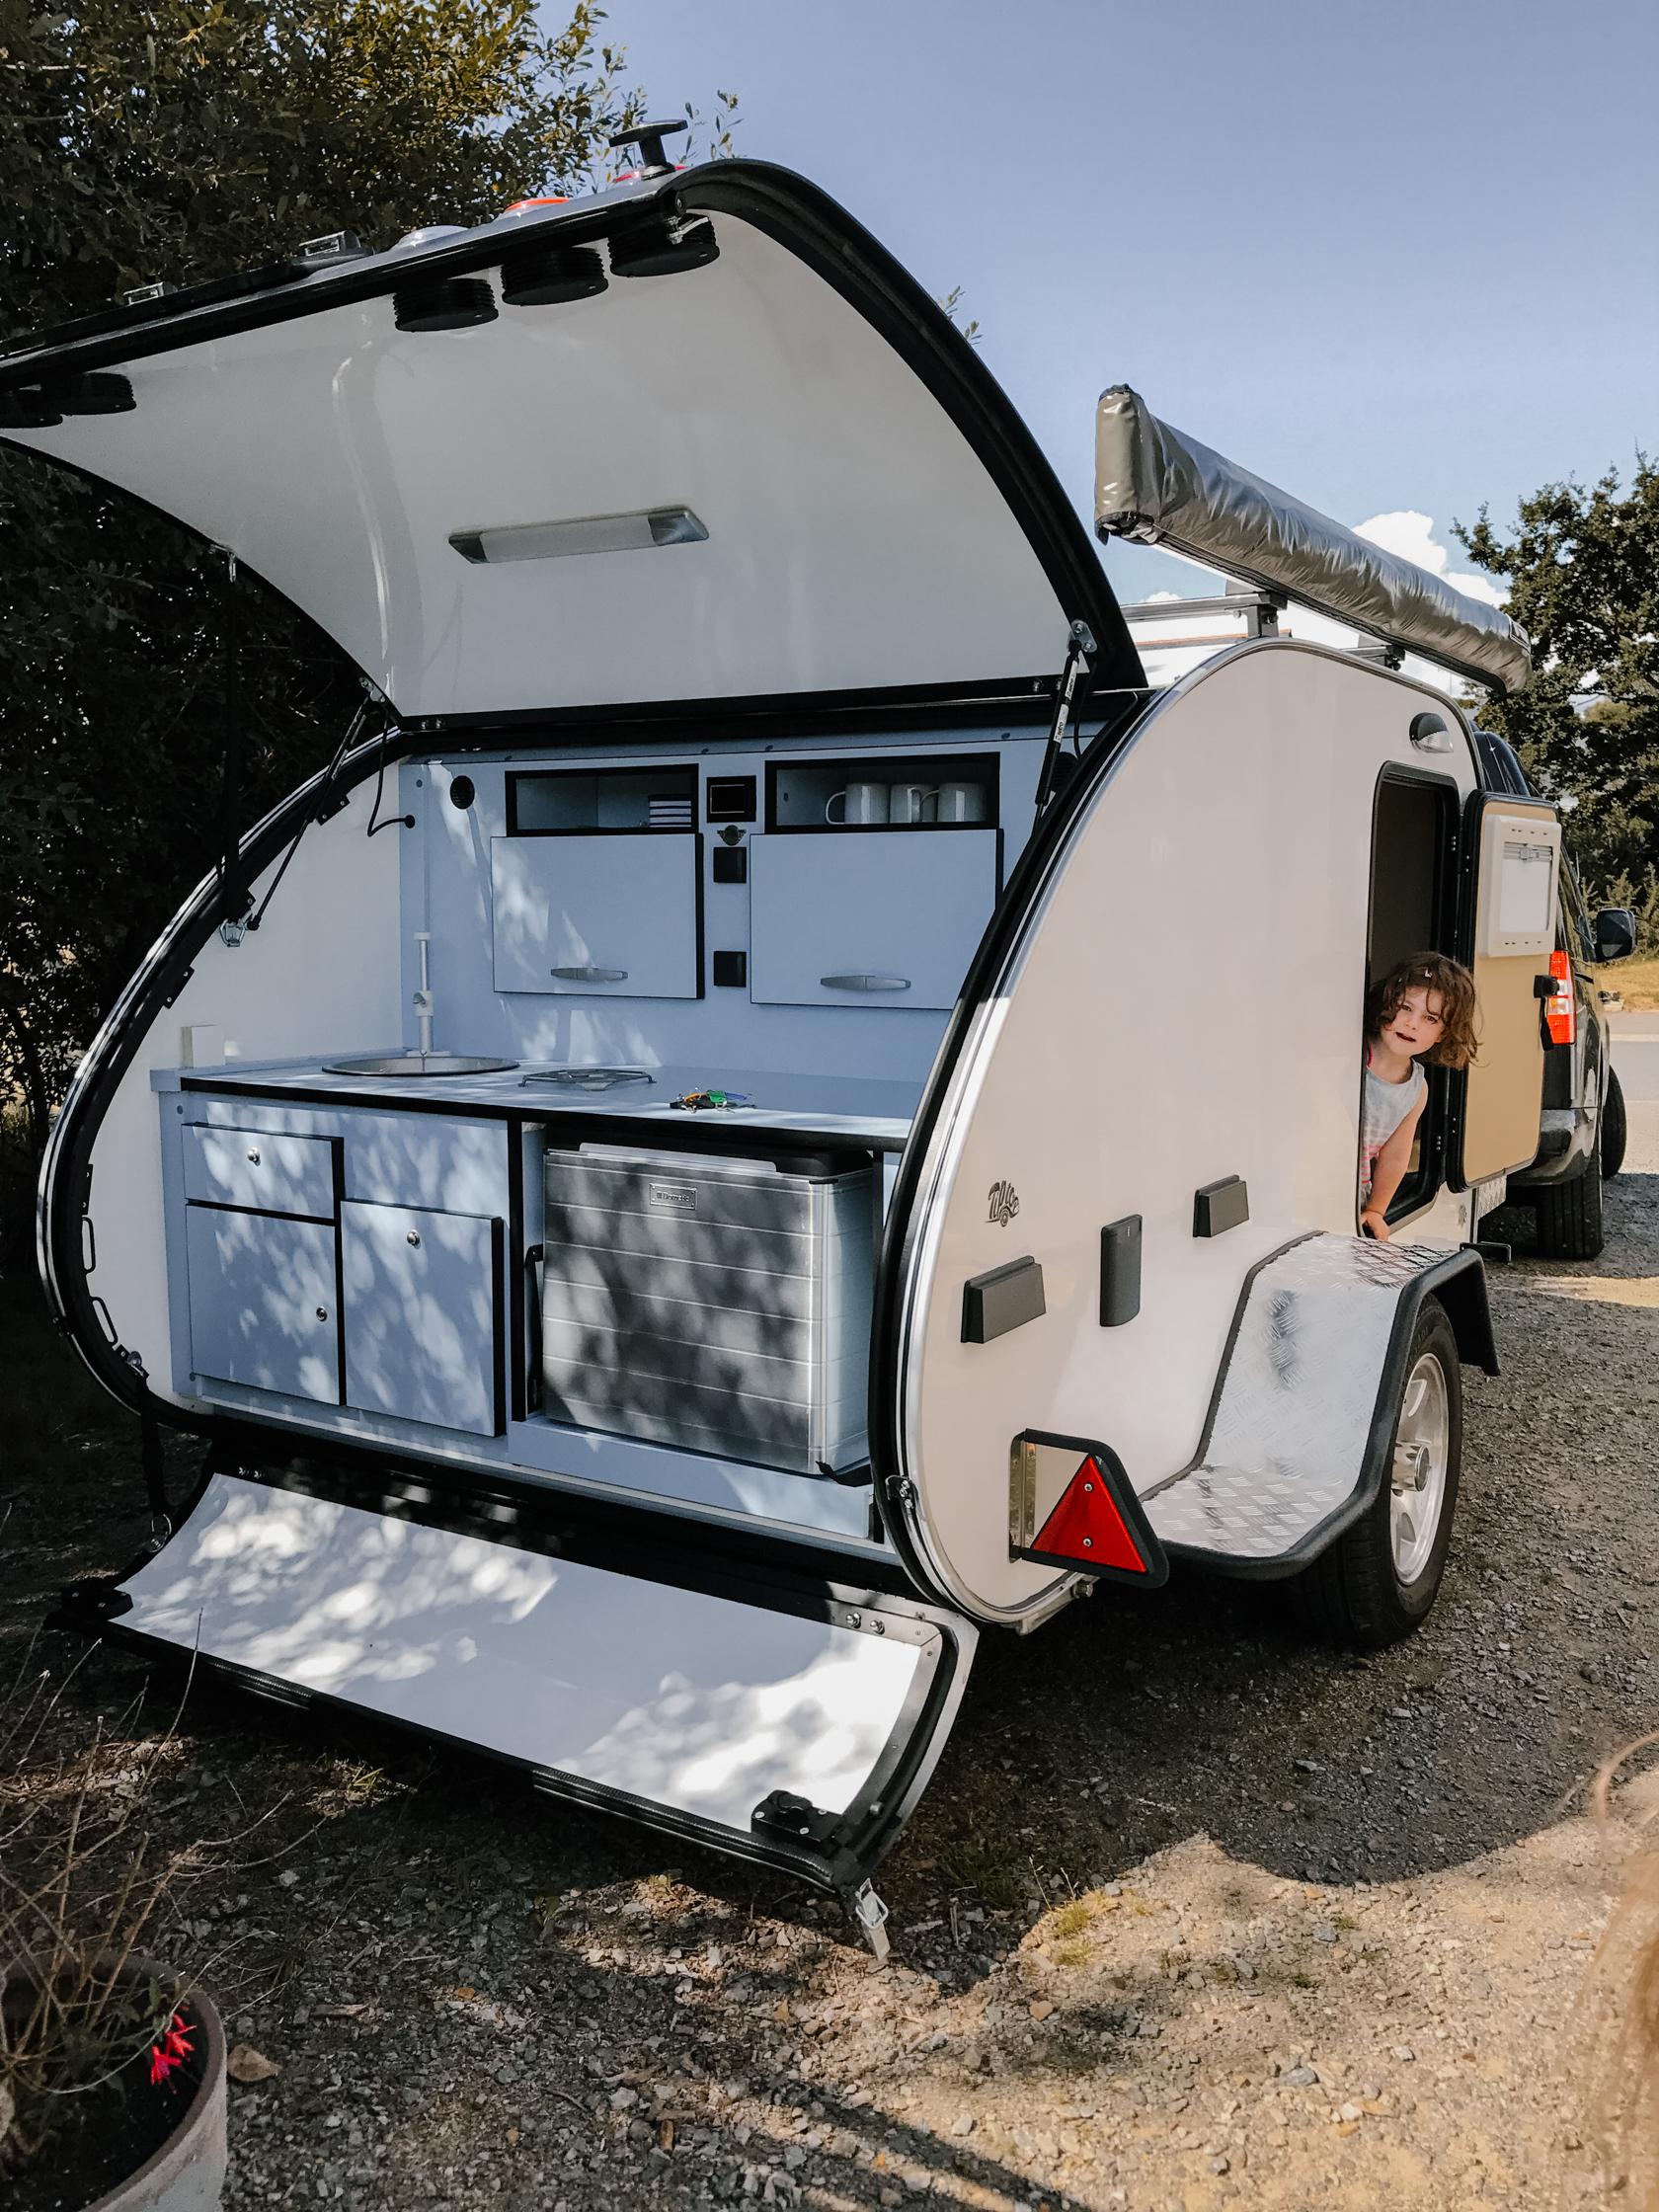 mini caravane tear drop hercule la grande ourse. Black Bedroom Furniture Sets. Home Design Ideas